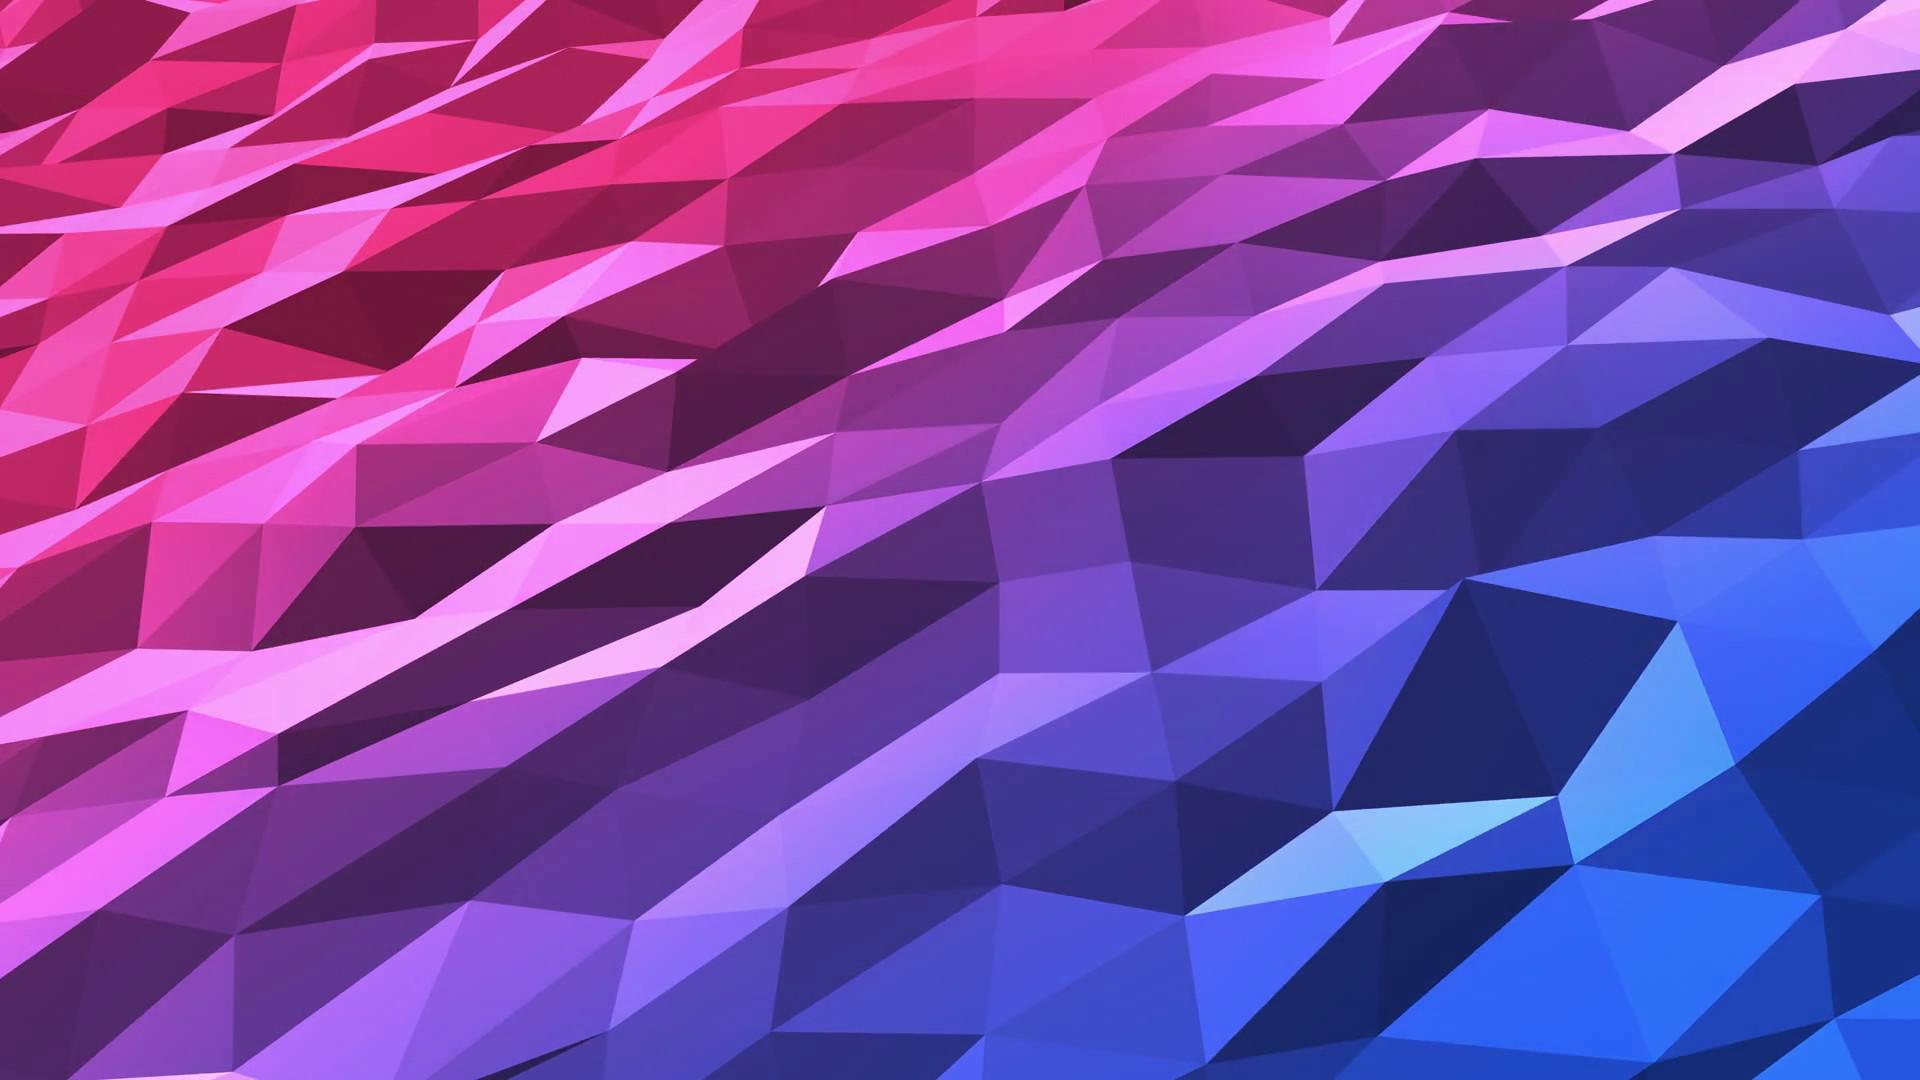 4k Resolution Purple And Blue Wallpaper 4k - Images | Slike